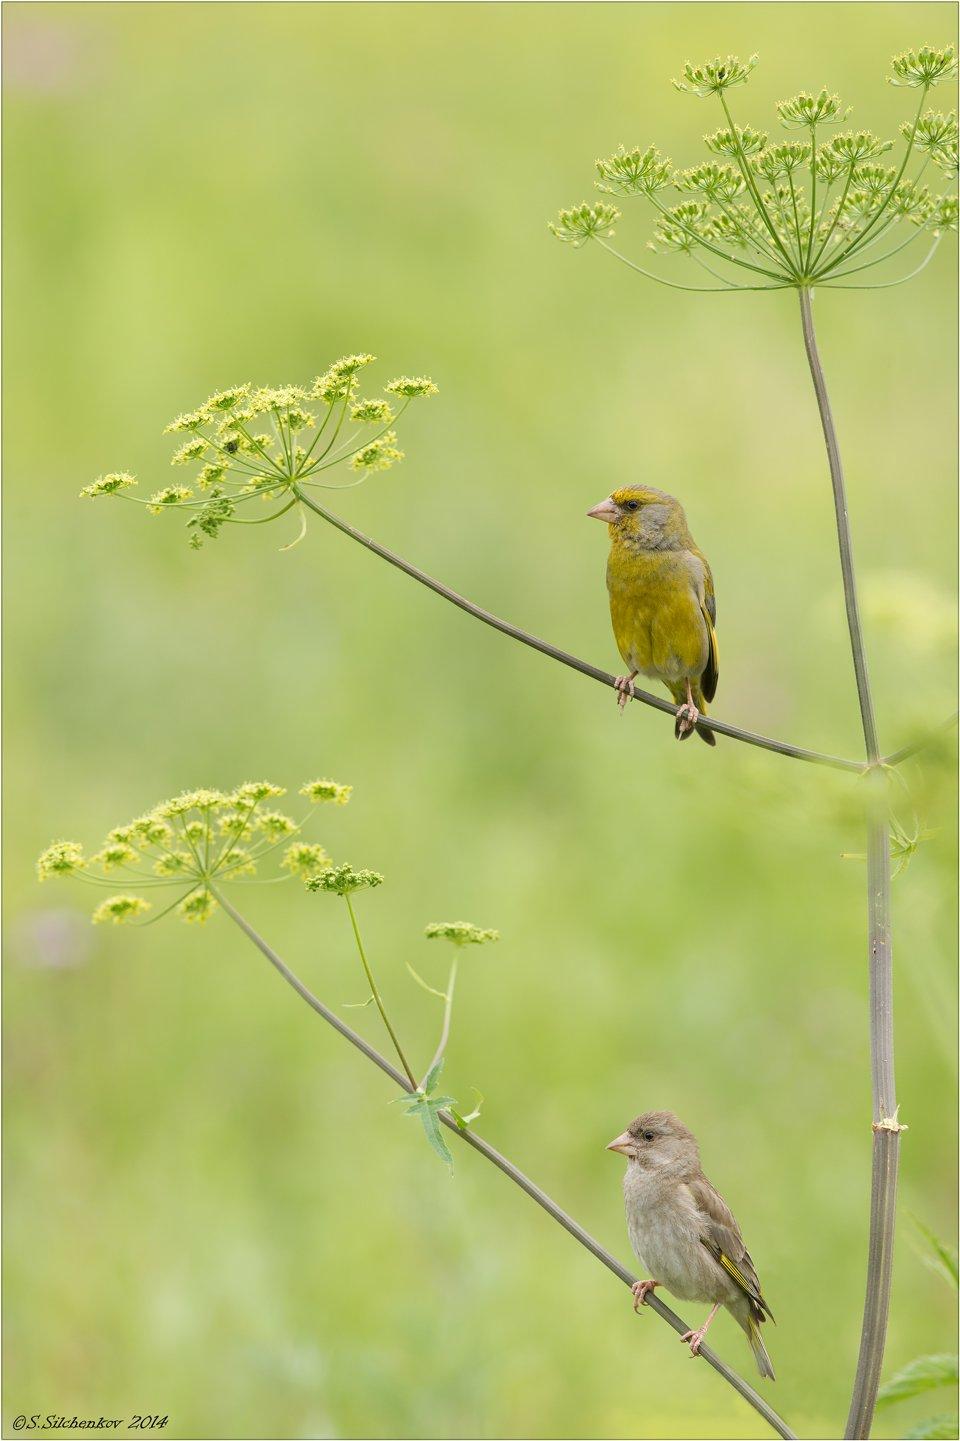 Зеленушка, Птицы, Сергей Сильченков